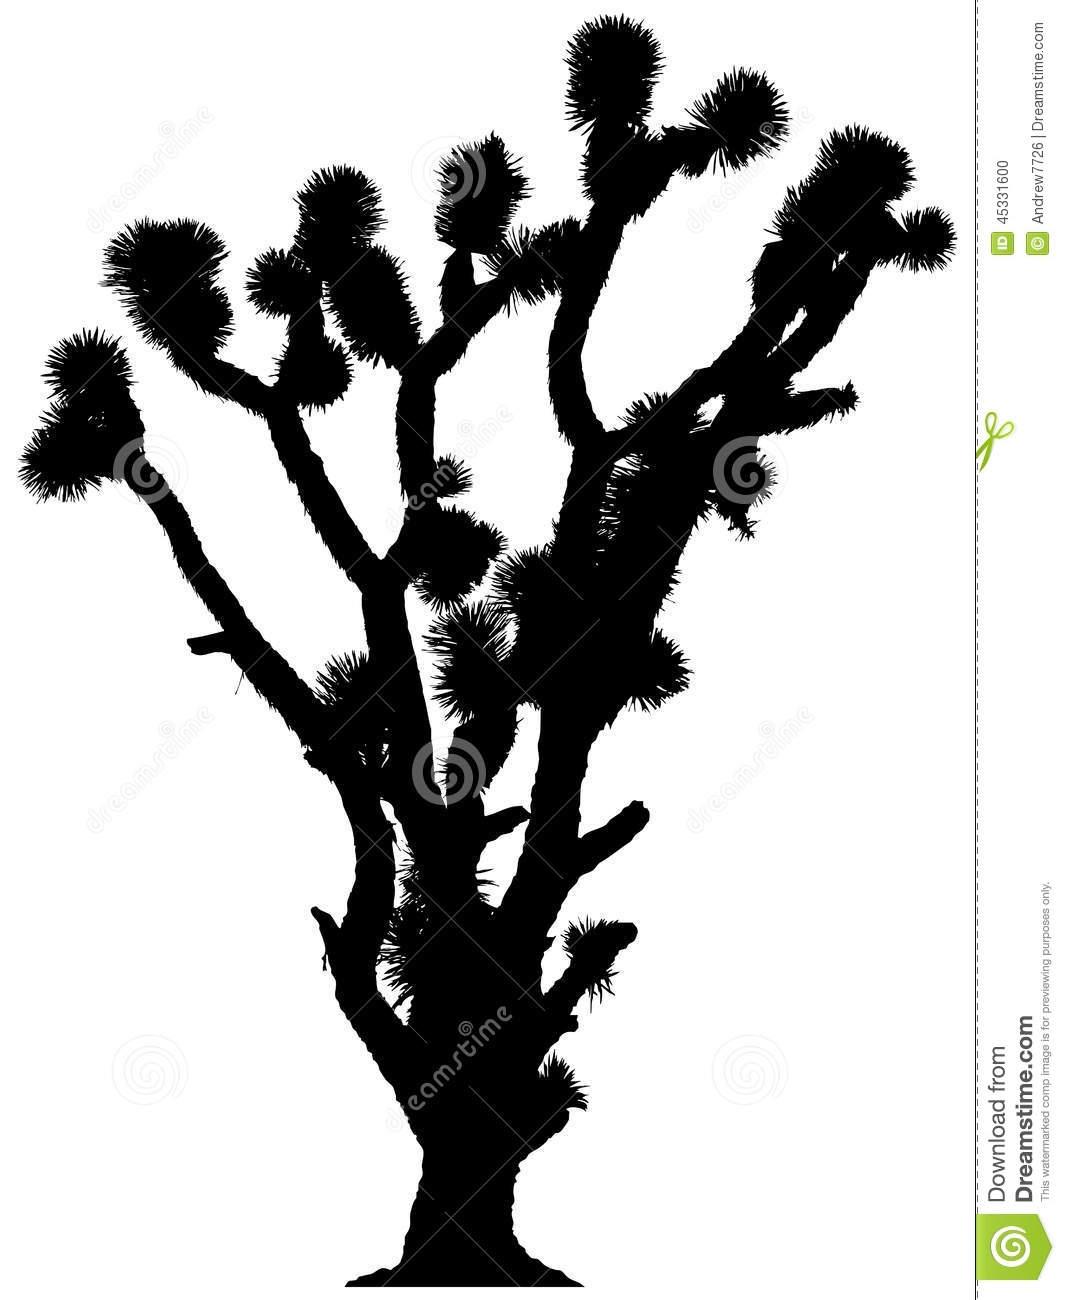 Joshua Tree clipart #5, Download drawings